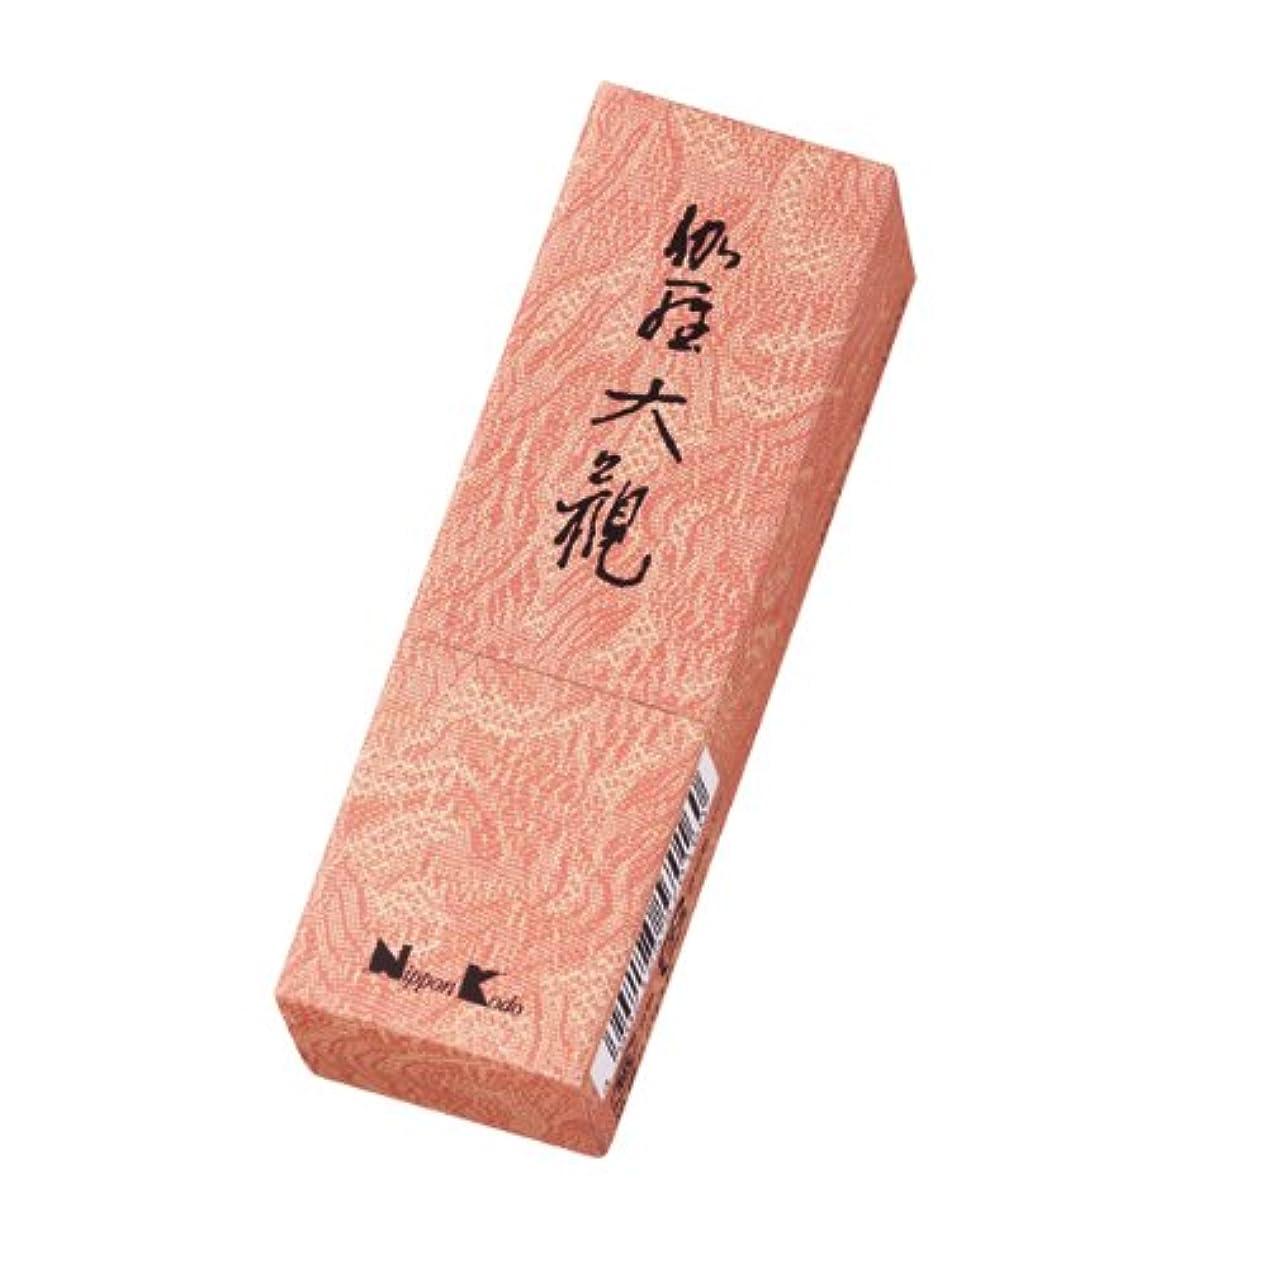 Nippon Kodo – Kyara Taikan – プレミアムAloeswood Incense 24 sticks